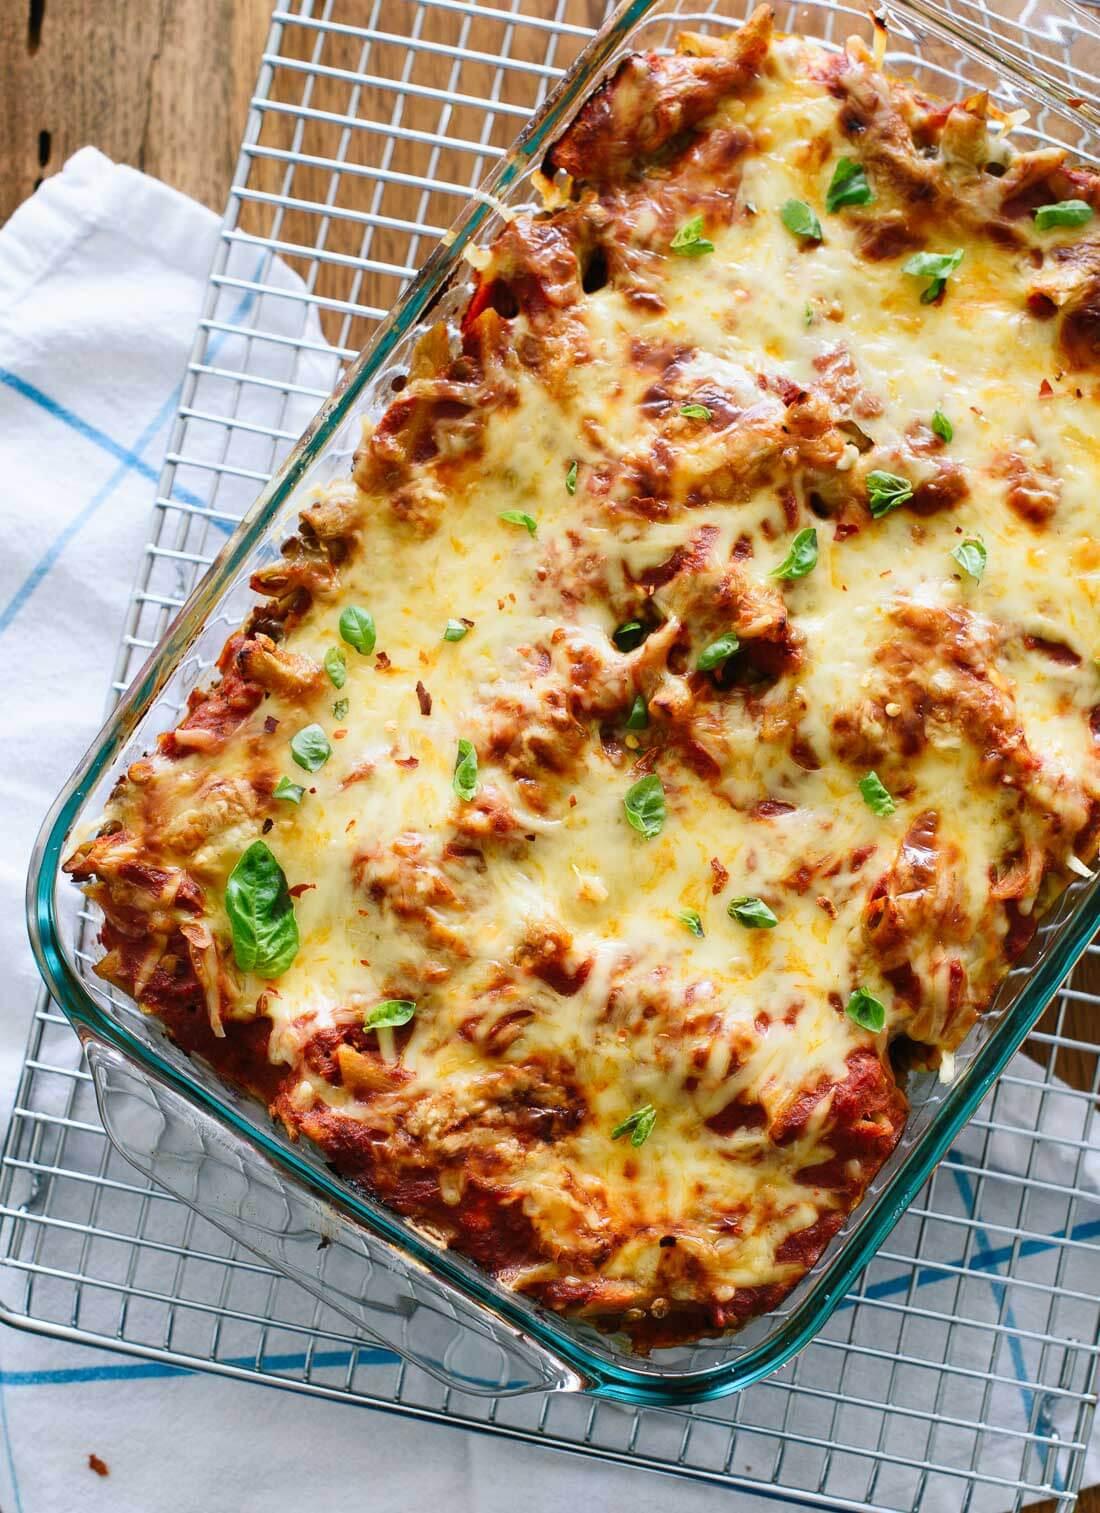 Bake Vegetarian Recipes  Lentil Baked Ziti Recipe Cookie and Kate